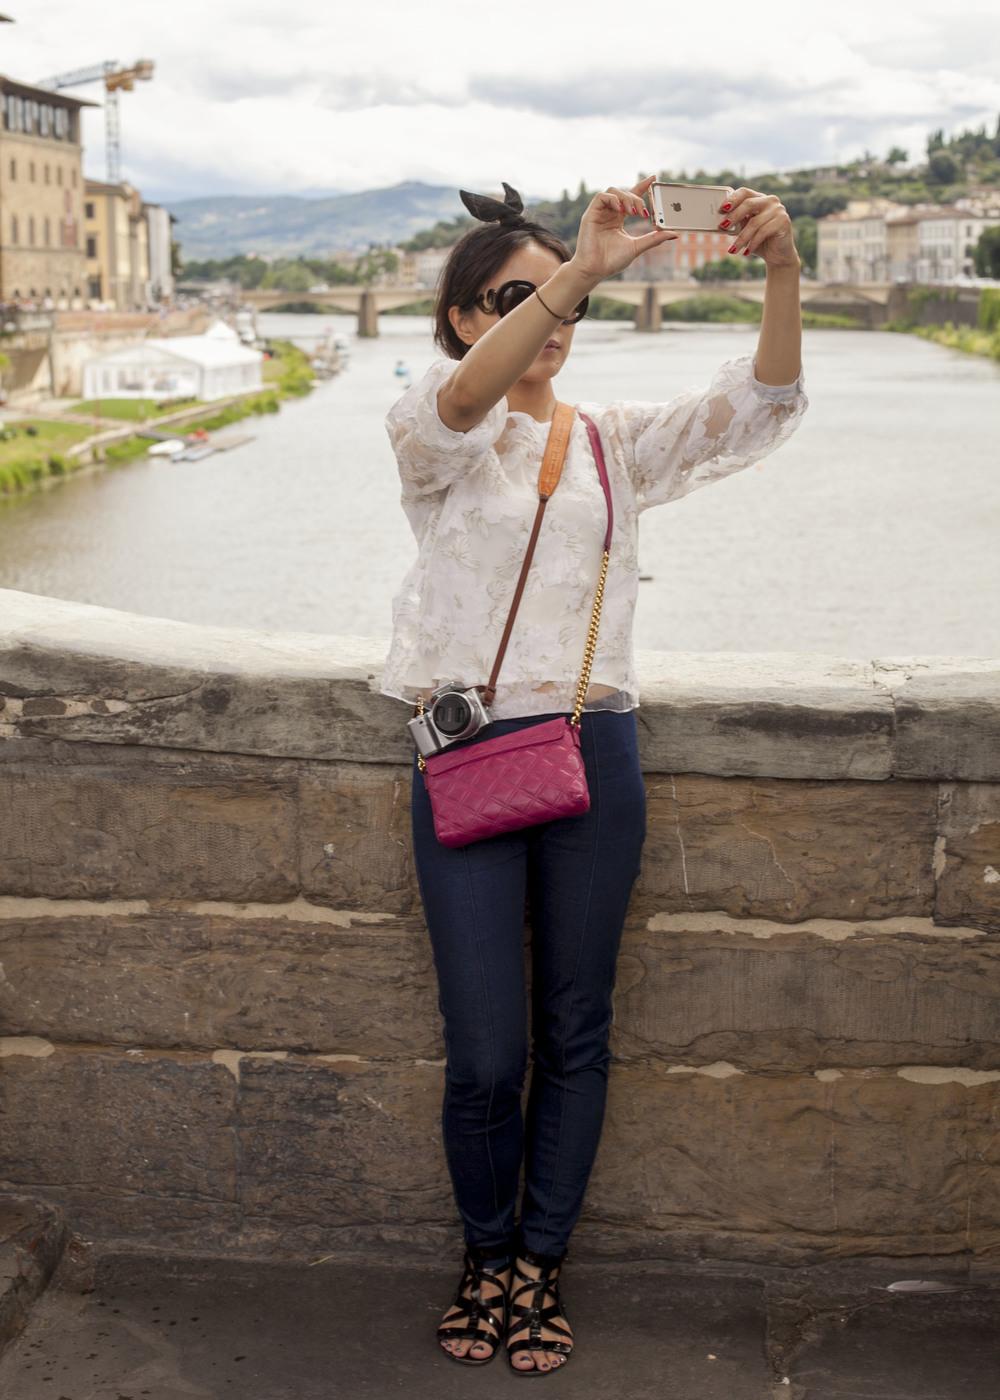 Renee Ricciardi Snapshots Florence Italy_13.jpg